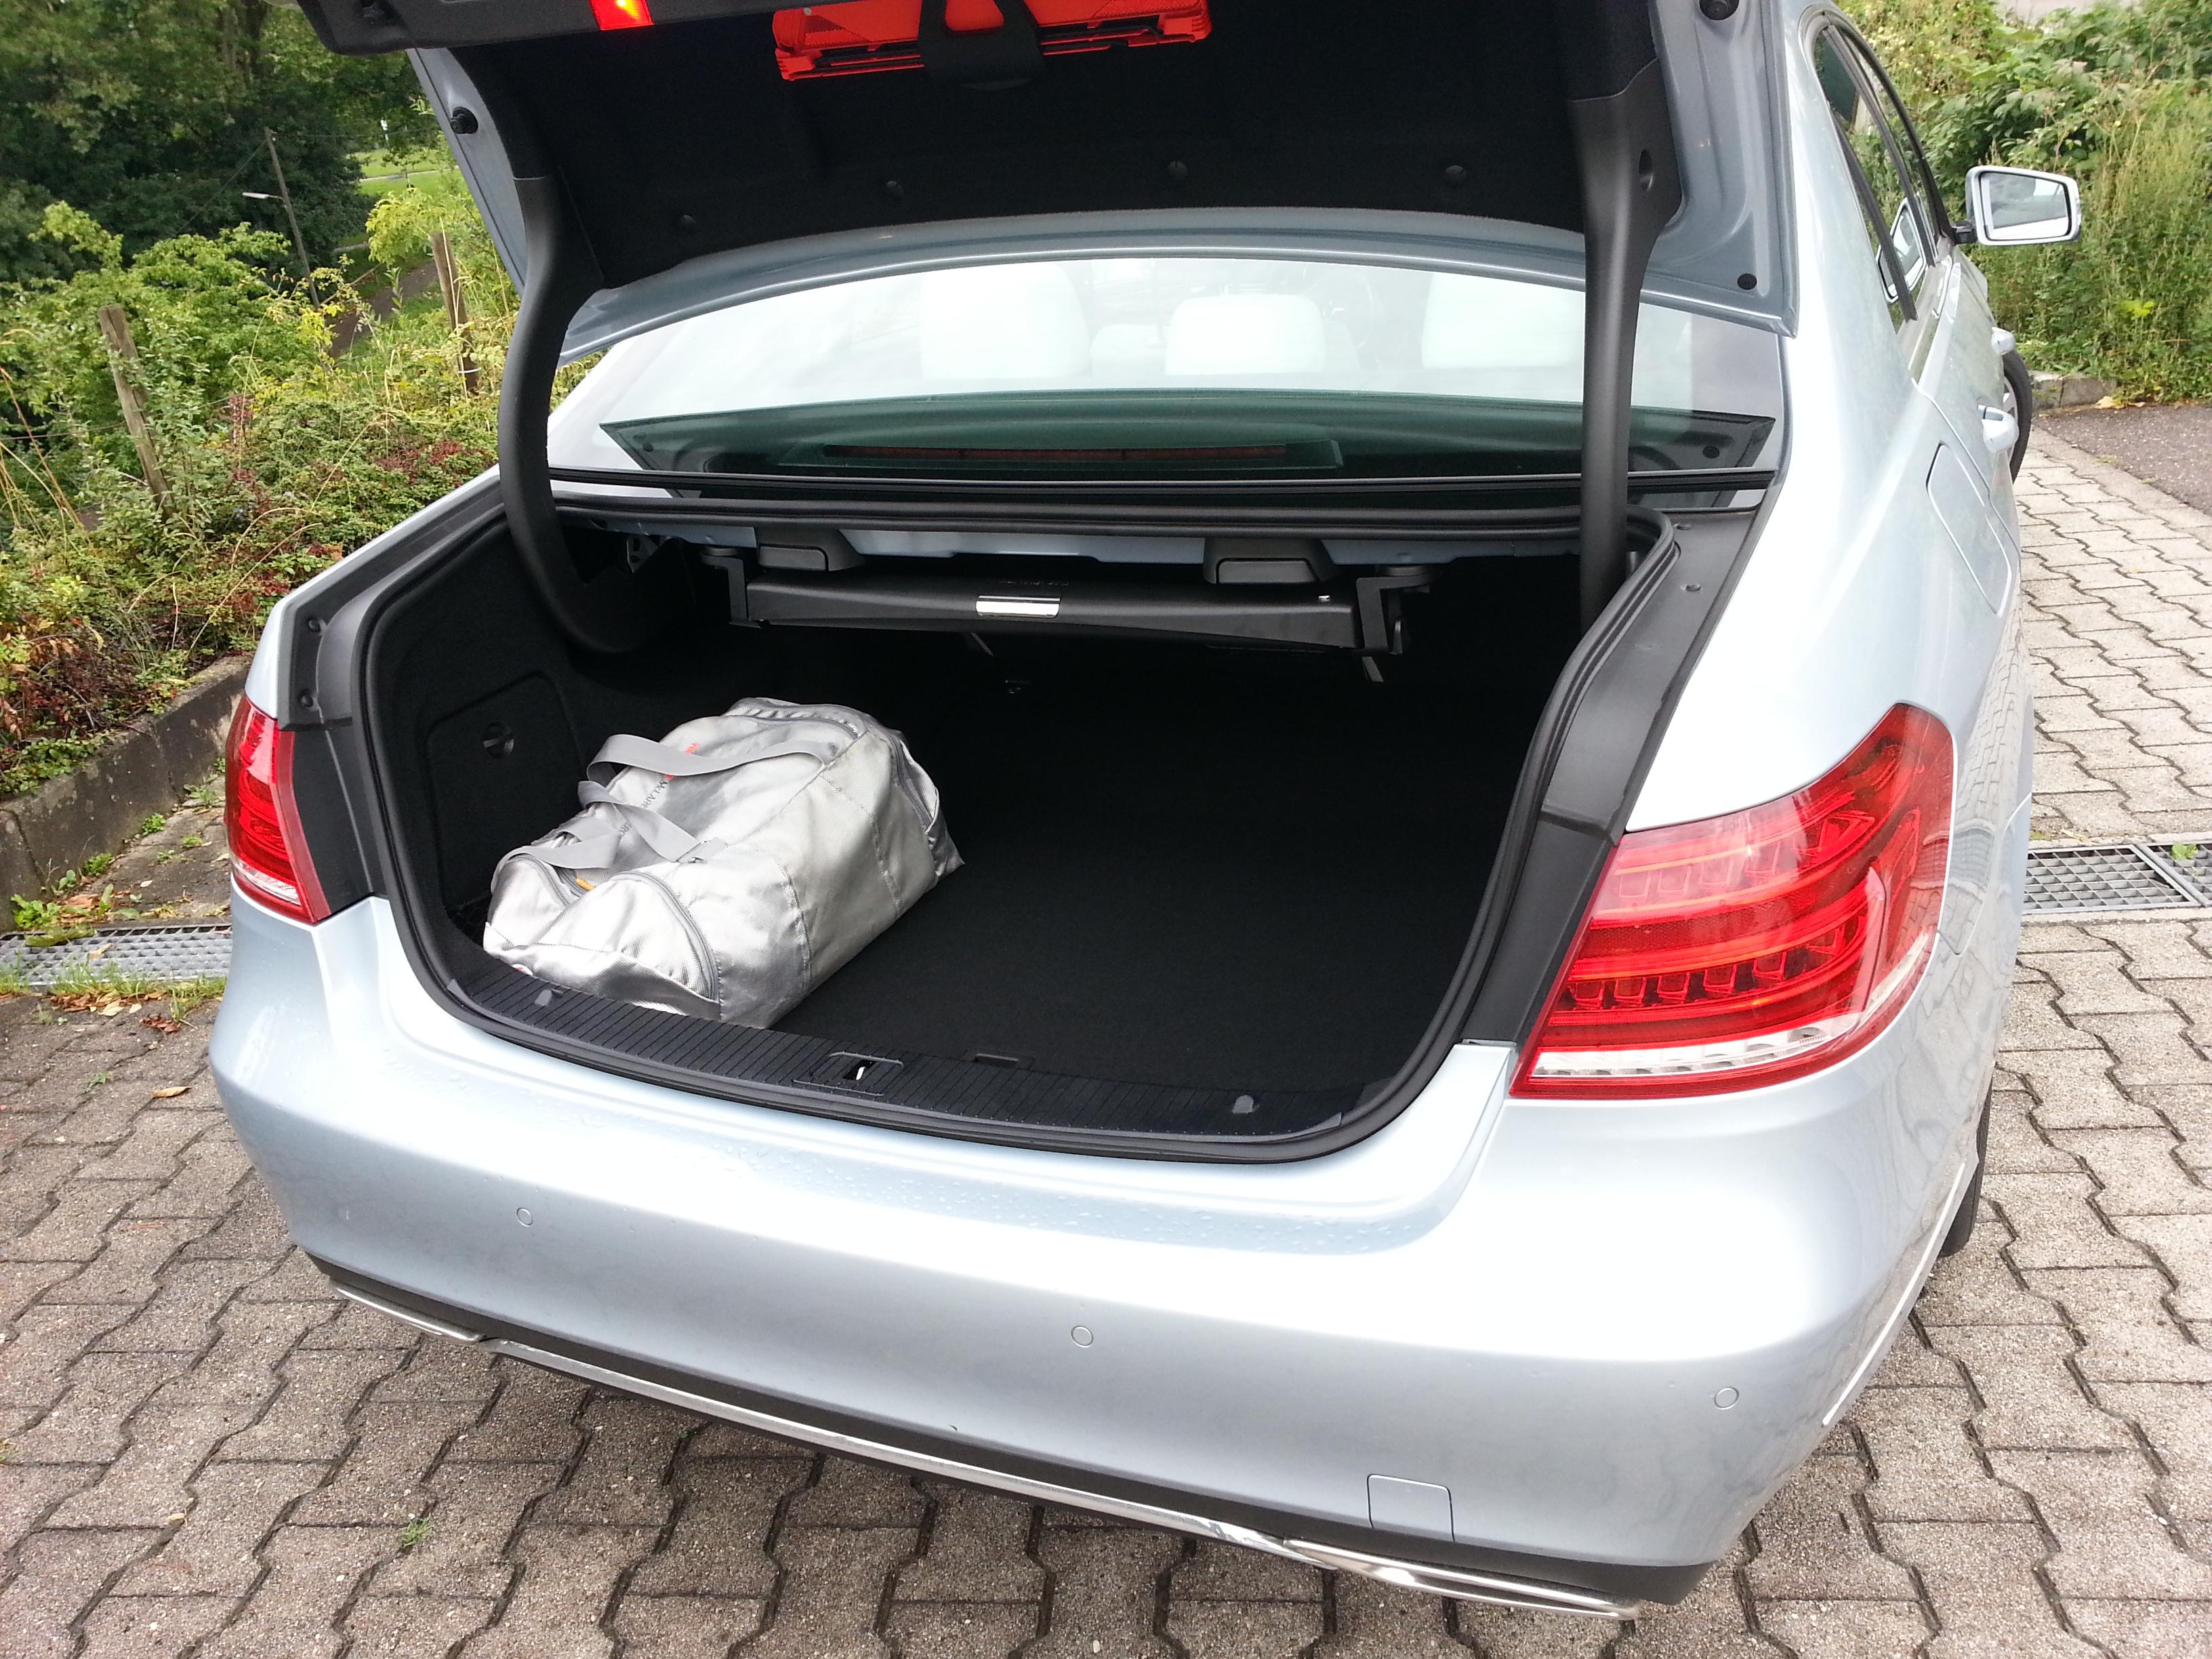 Mercedes-Benz E 300 BlueTec Hybrid Kofferraum